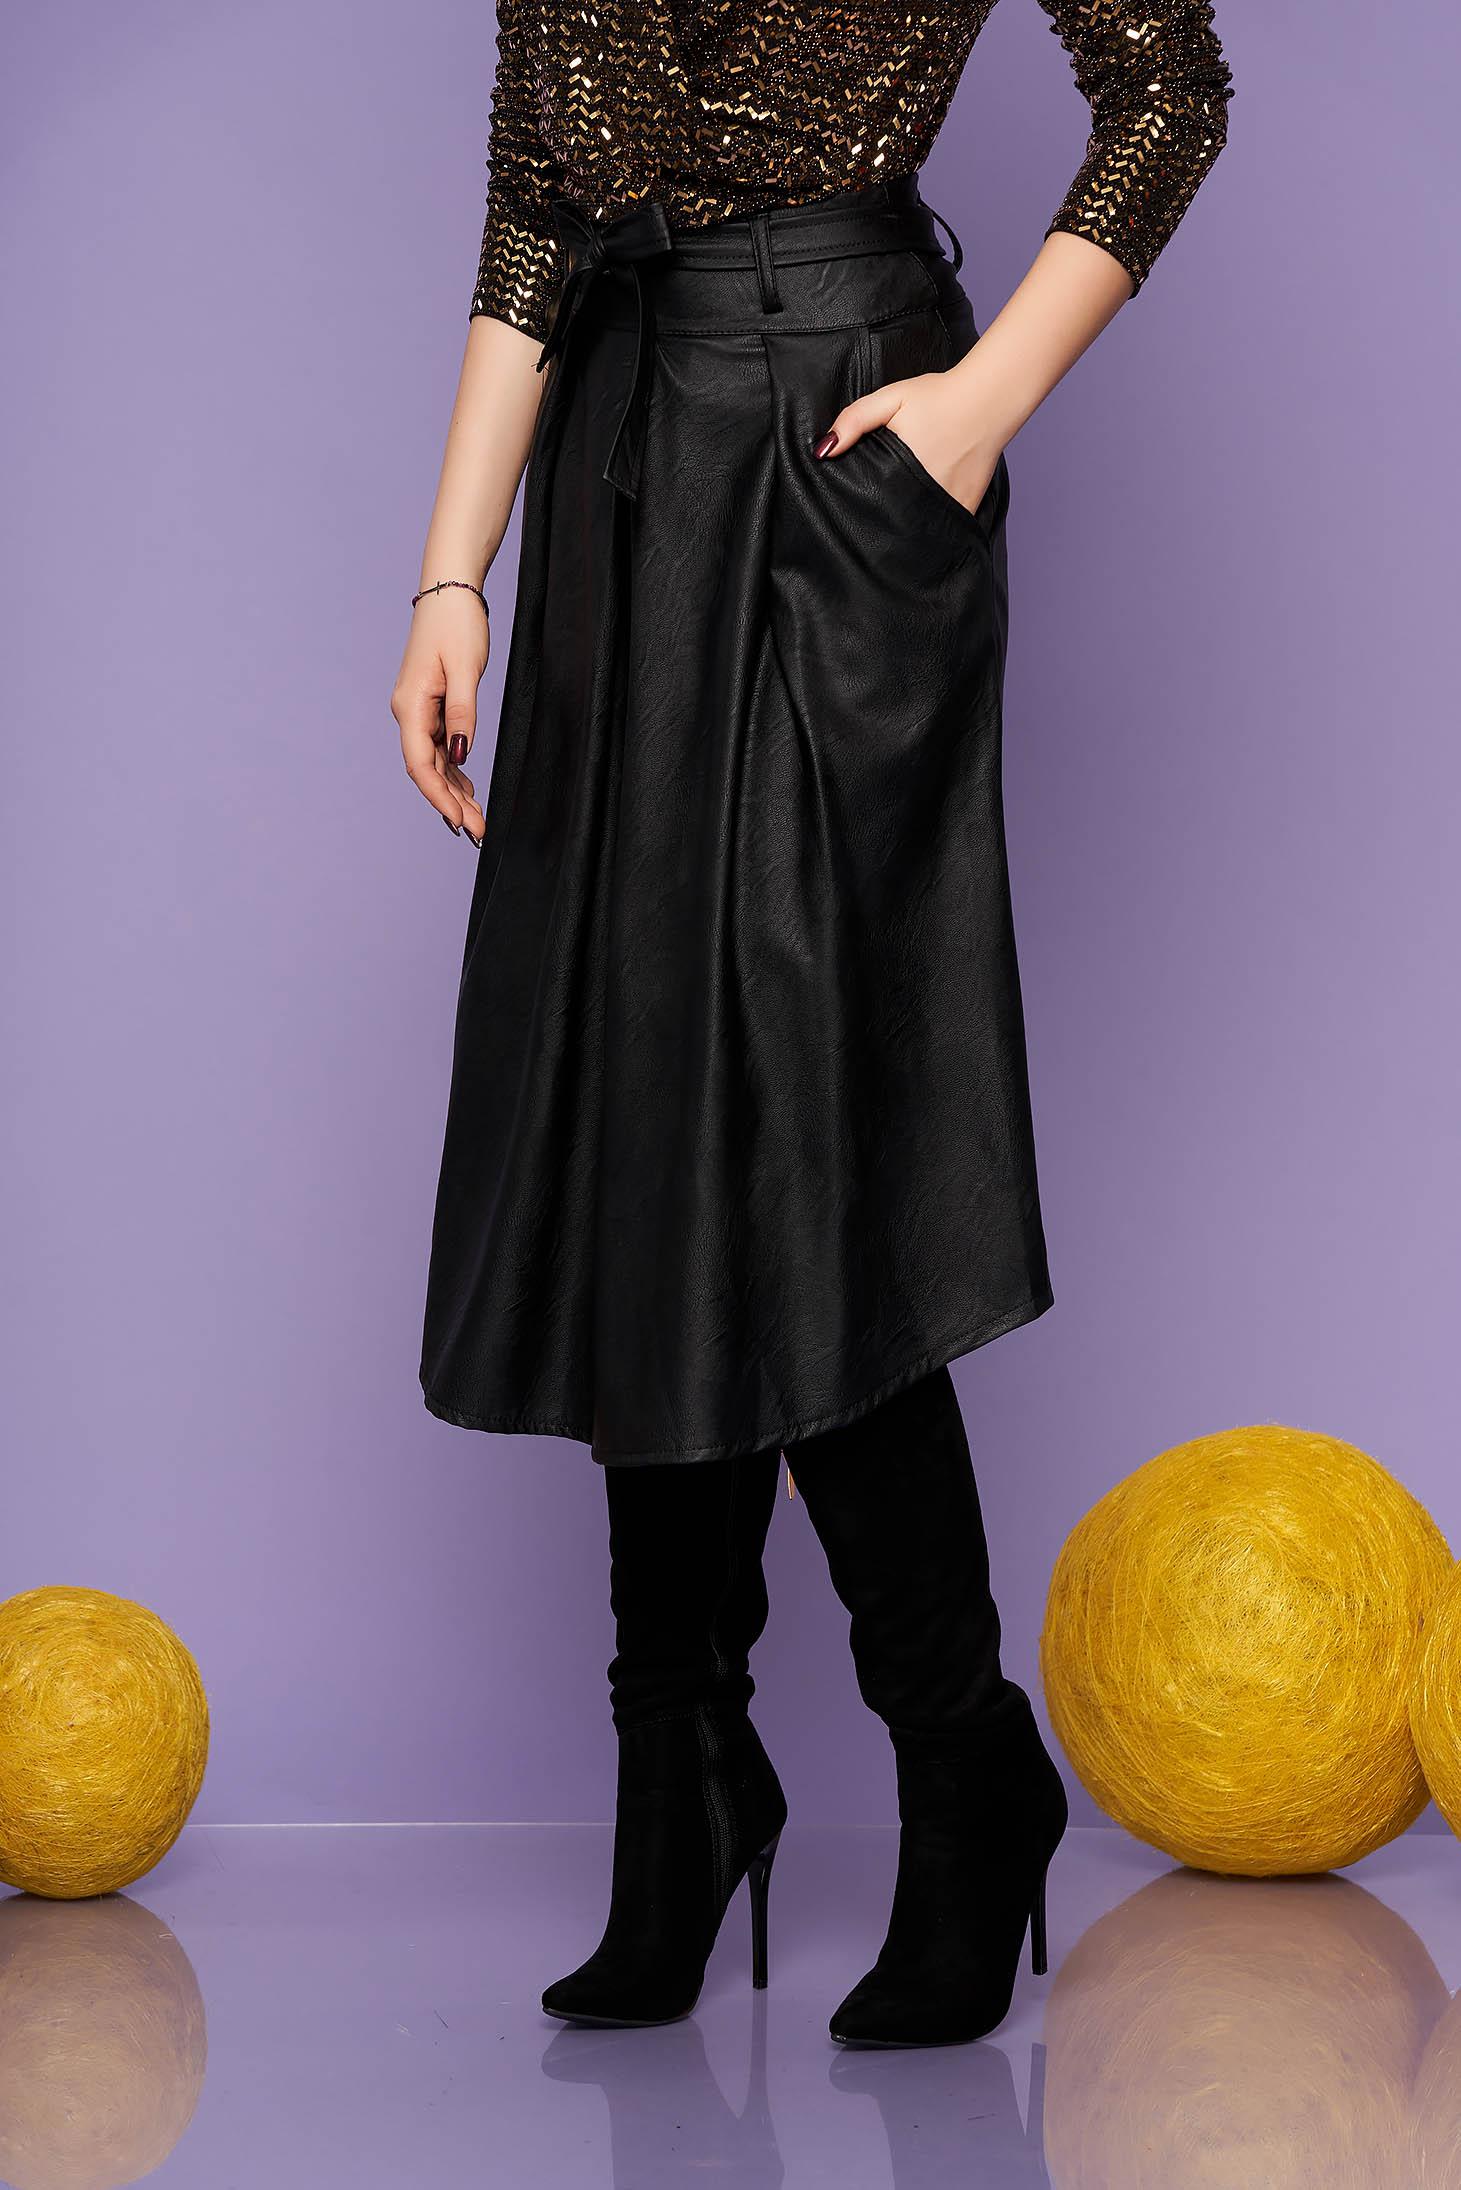 Fusta SunShine neagra casual midi din piele ecologica in clos cu buzunare si cordon detasabil care se inchide cu fermoar la spate